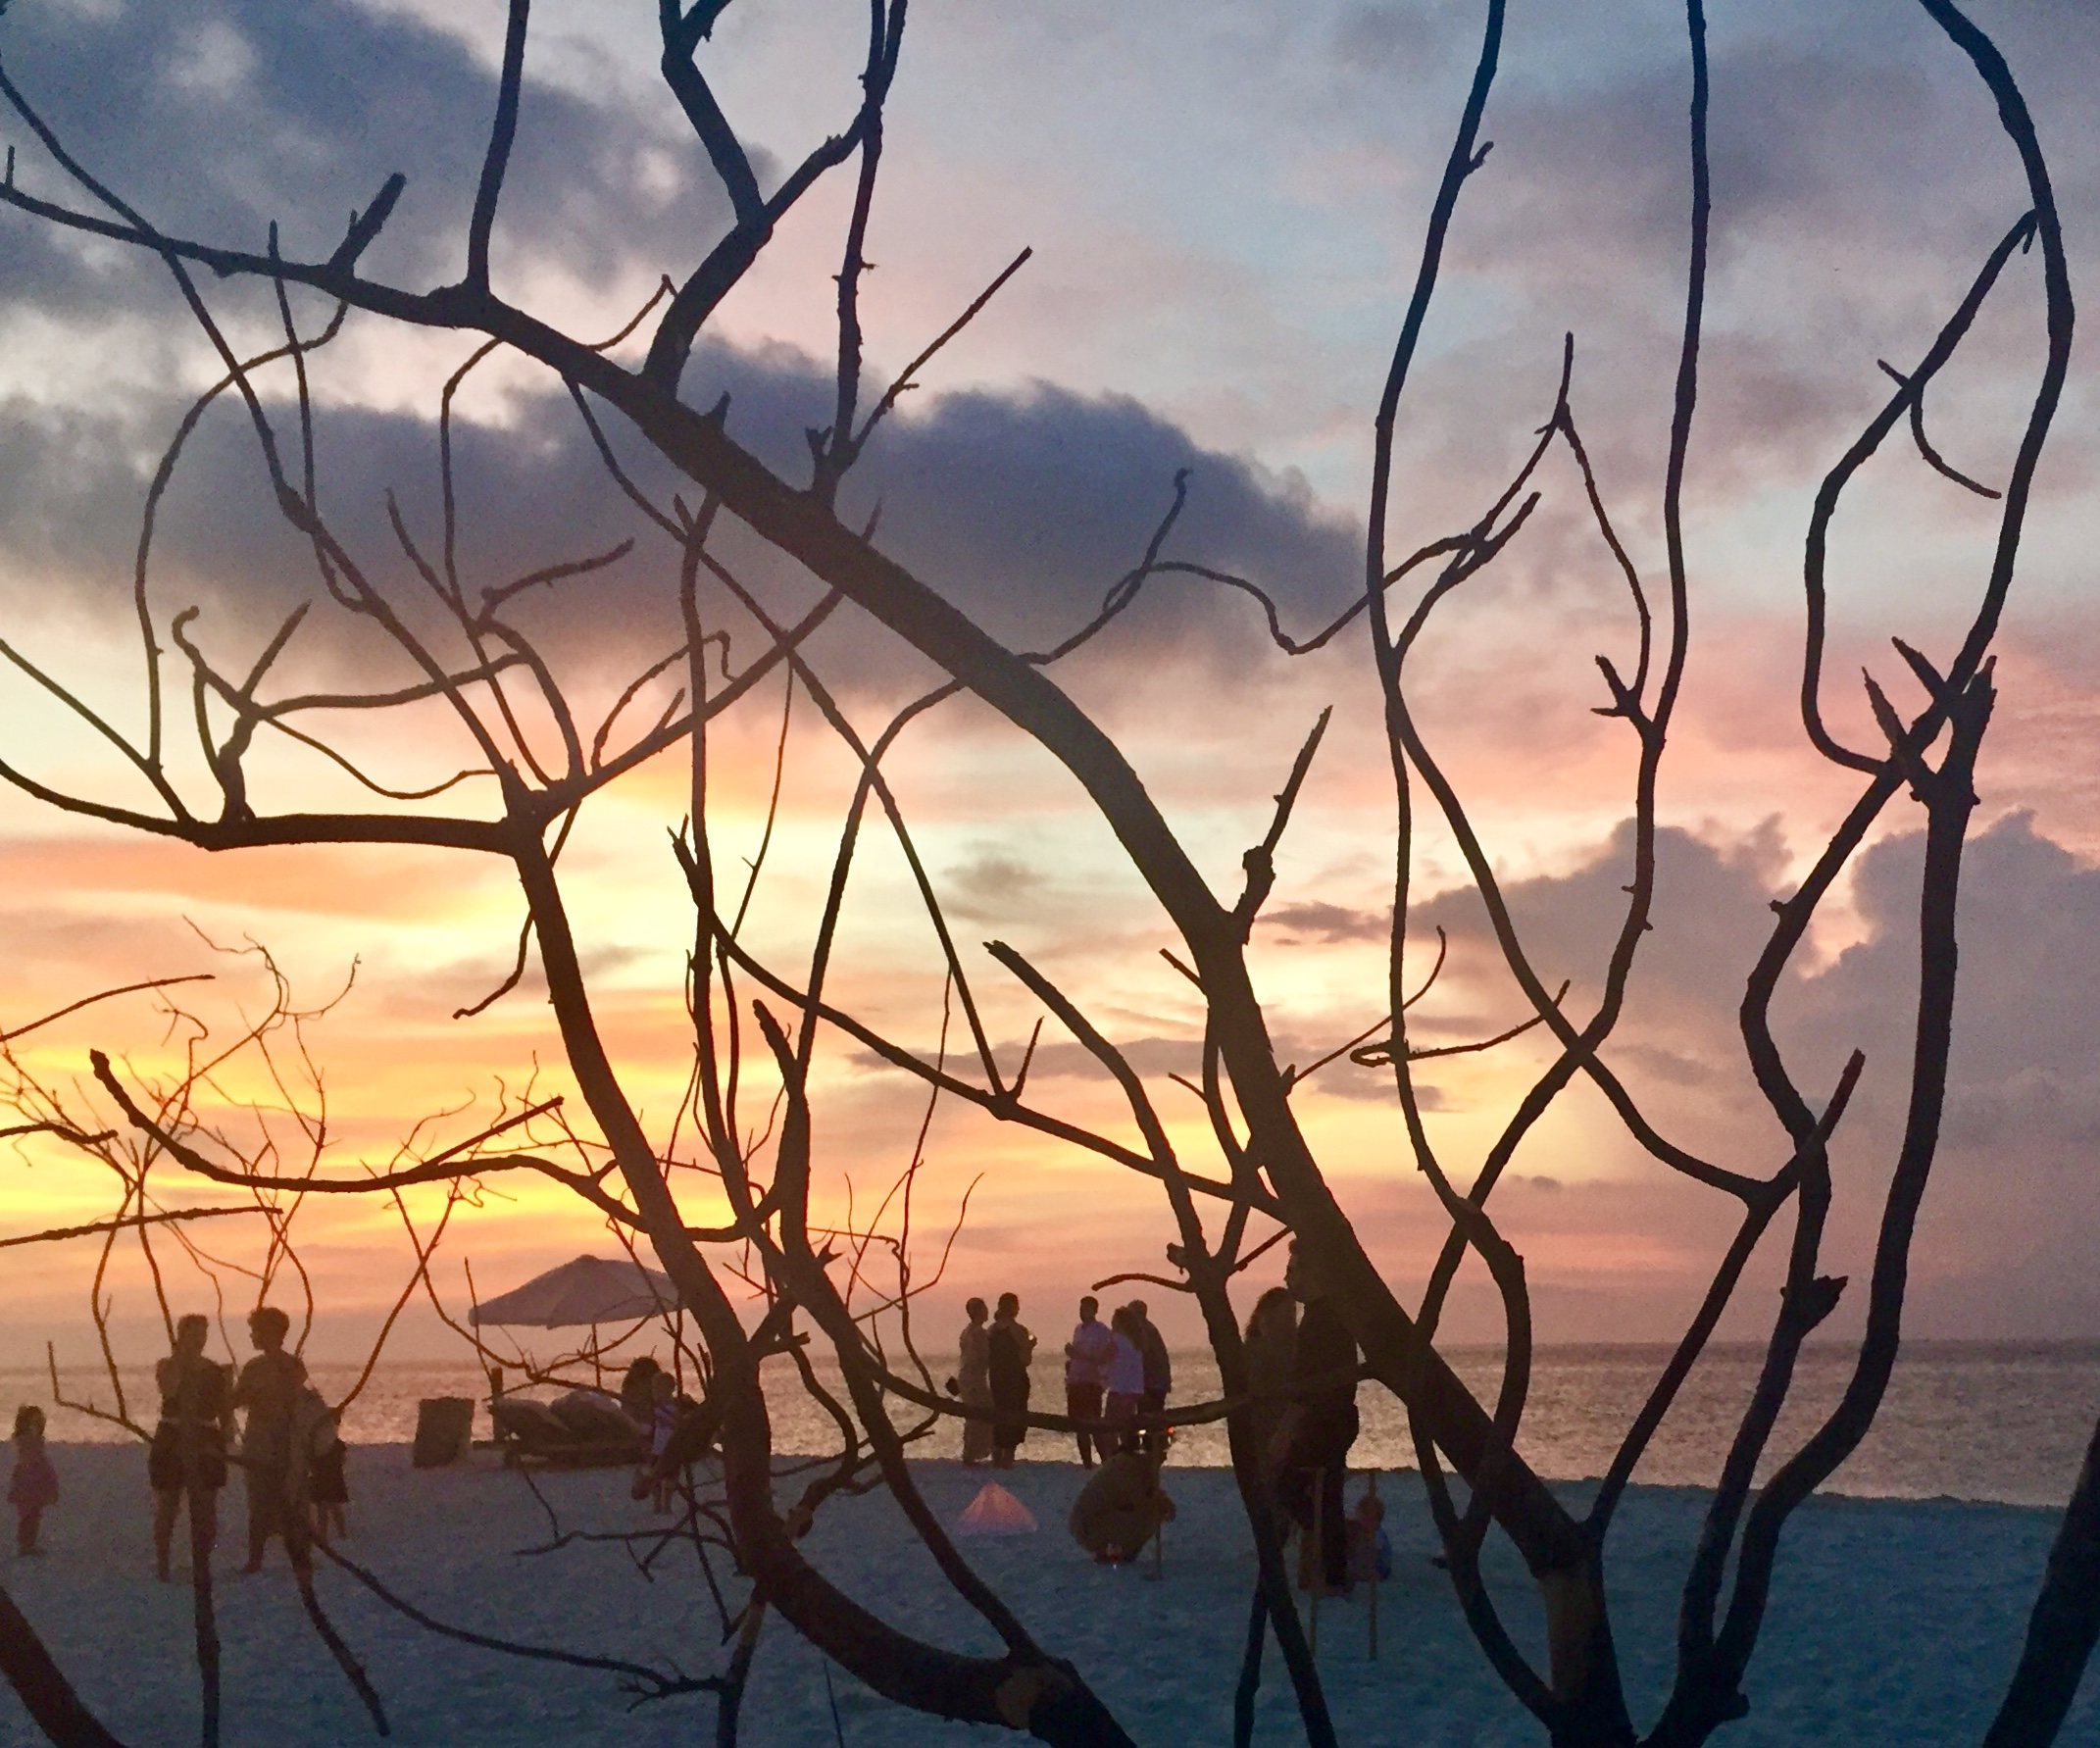 TUI-Berlin-Reisebüro-Malediven-Soneva-Fushi-Sandbankdinner